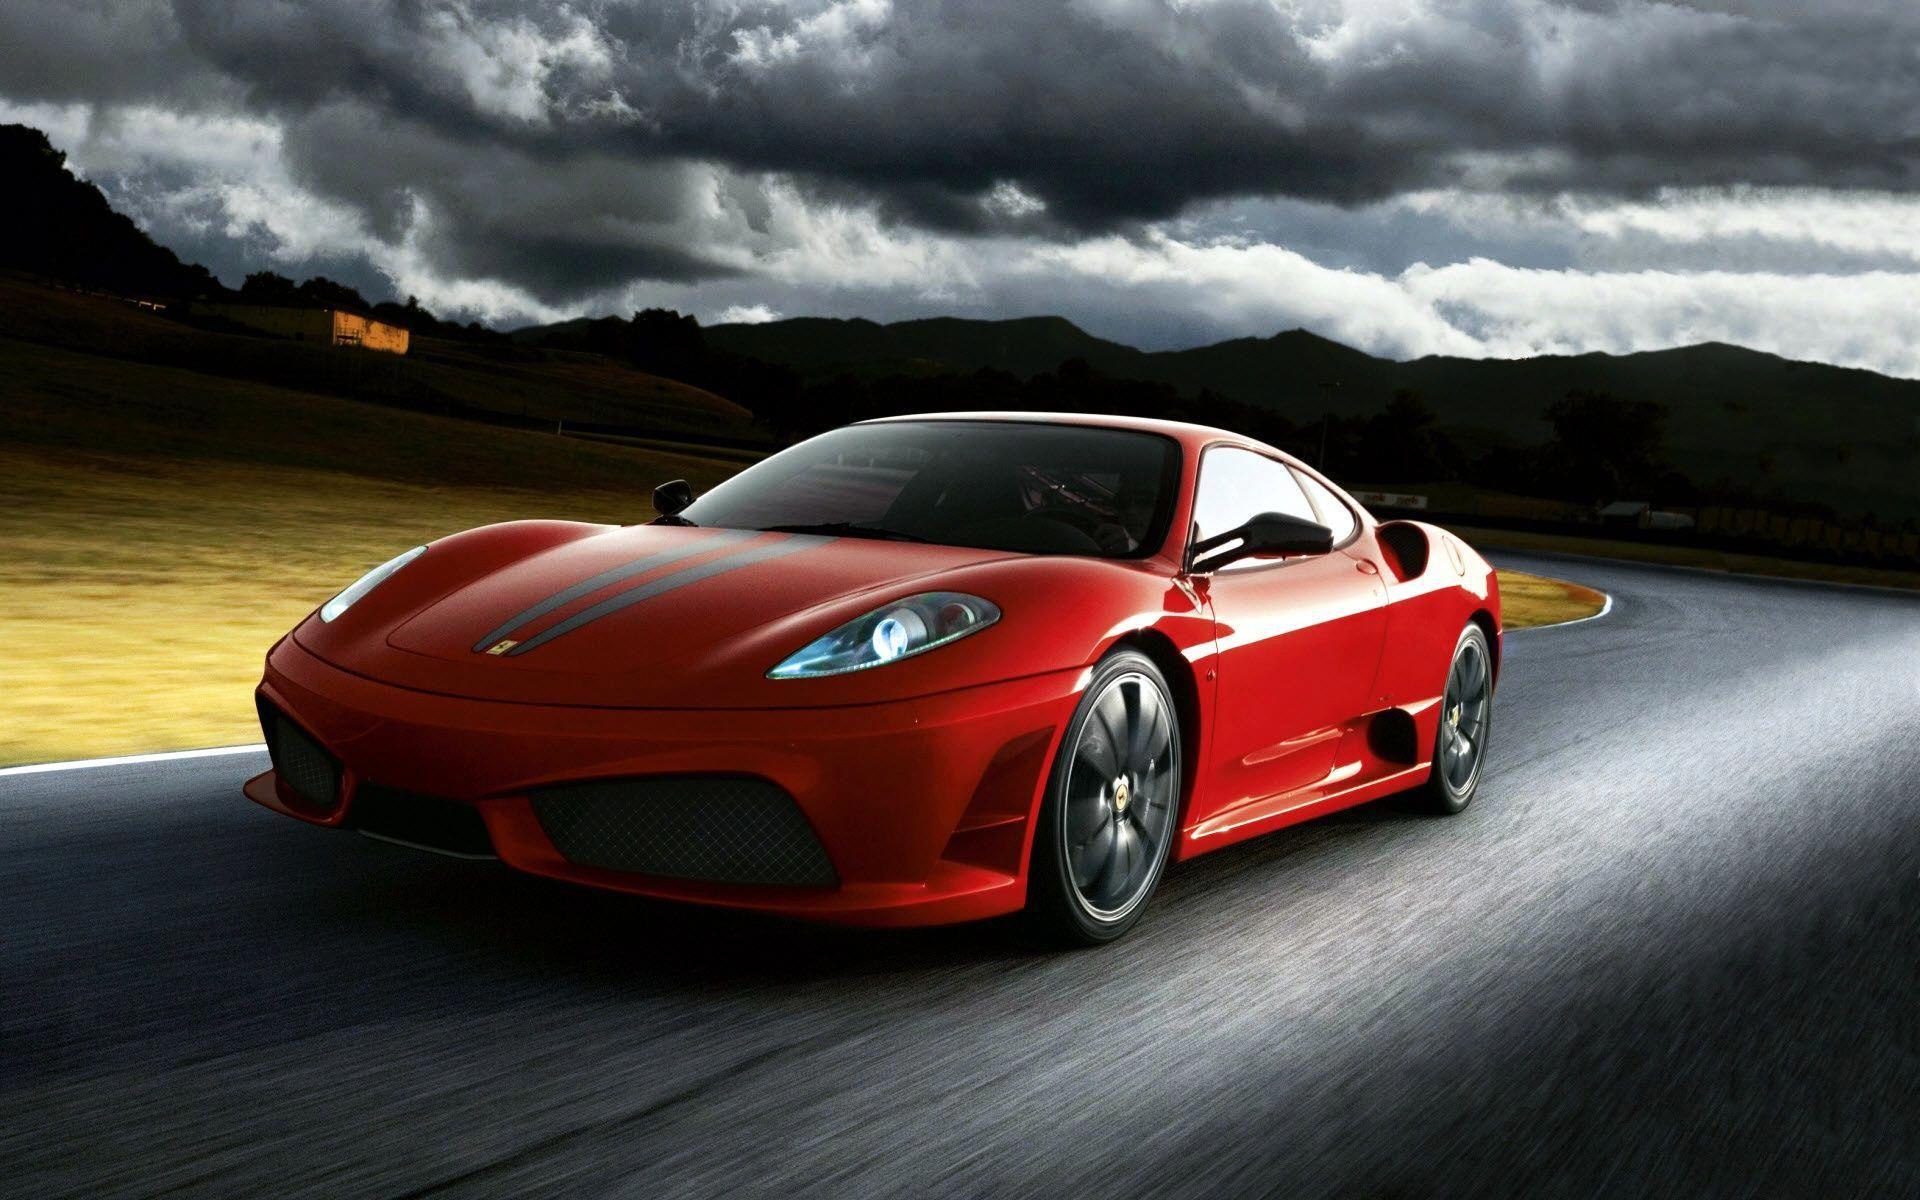 The Exciting Ferrari Enzo Ferrari, Super cars, Supercars